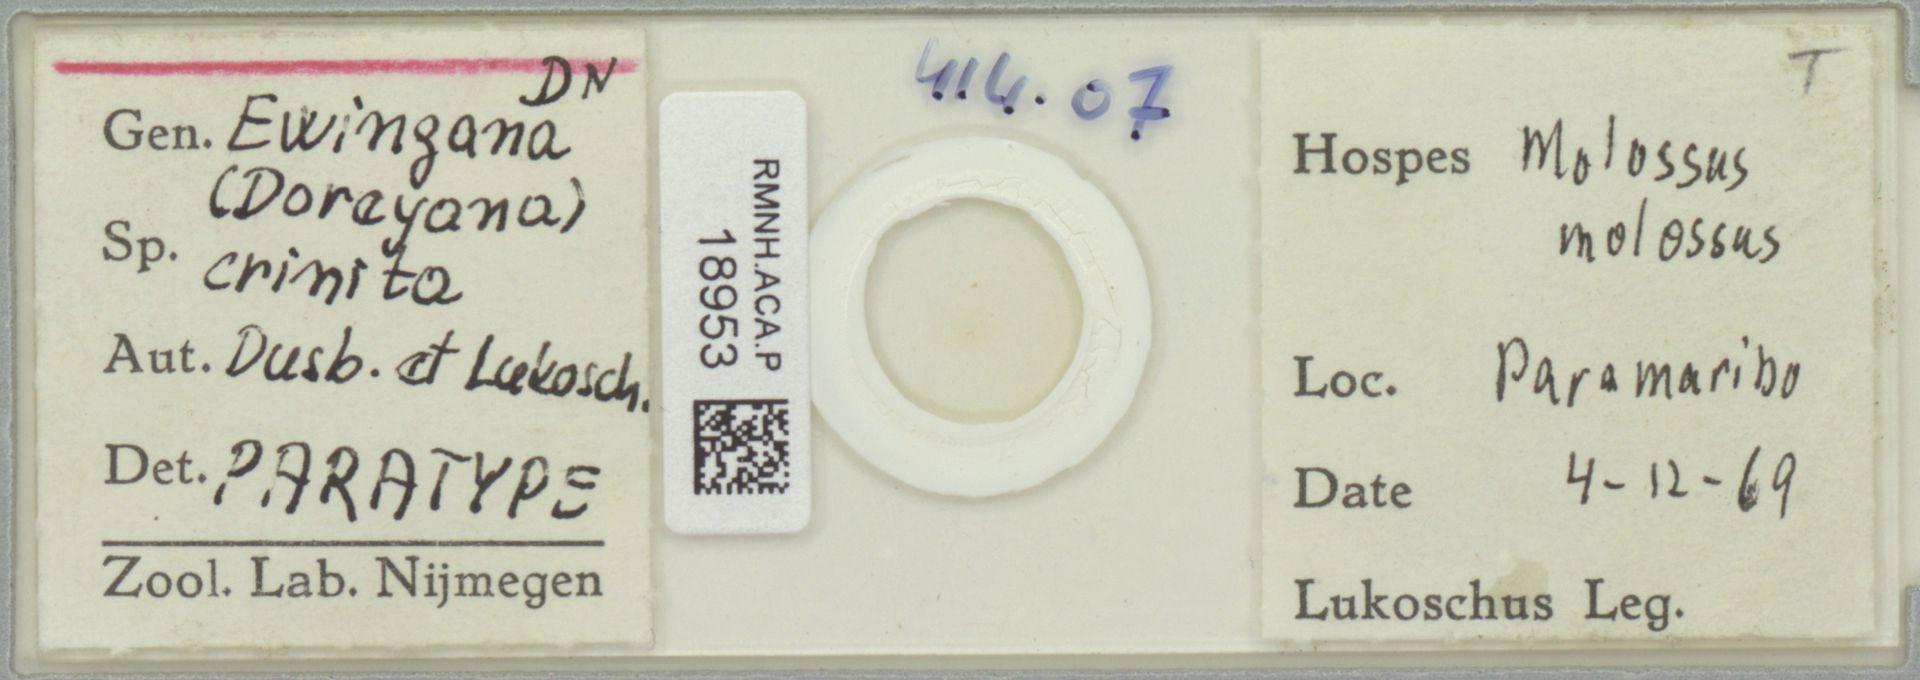 RMNH.ACA.P.18953 | Ewingana (Doreyana) crinita